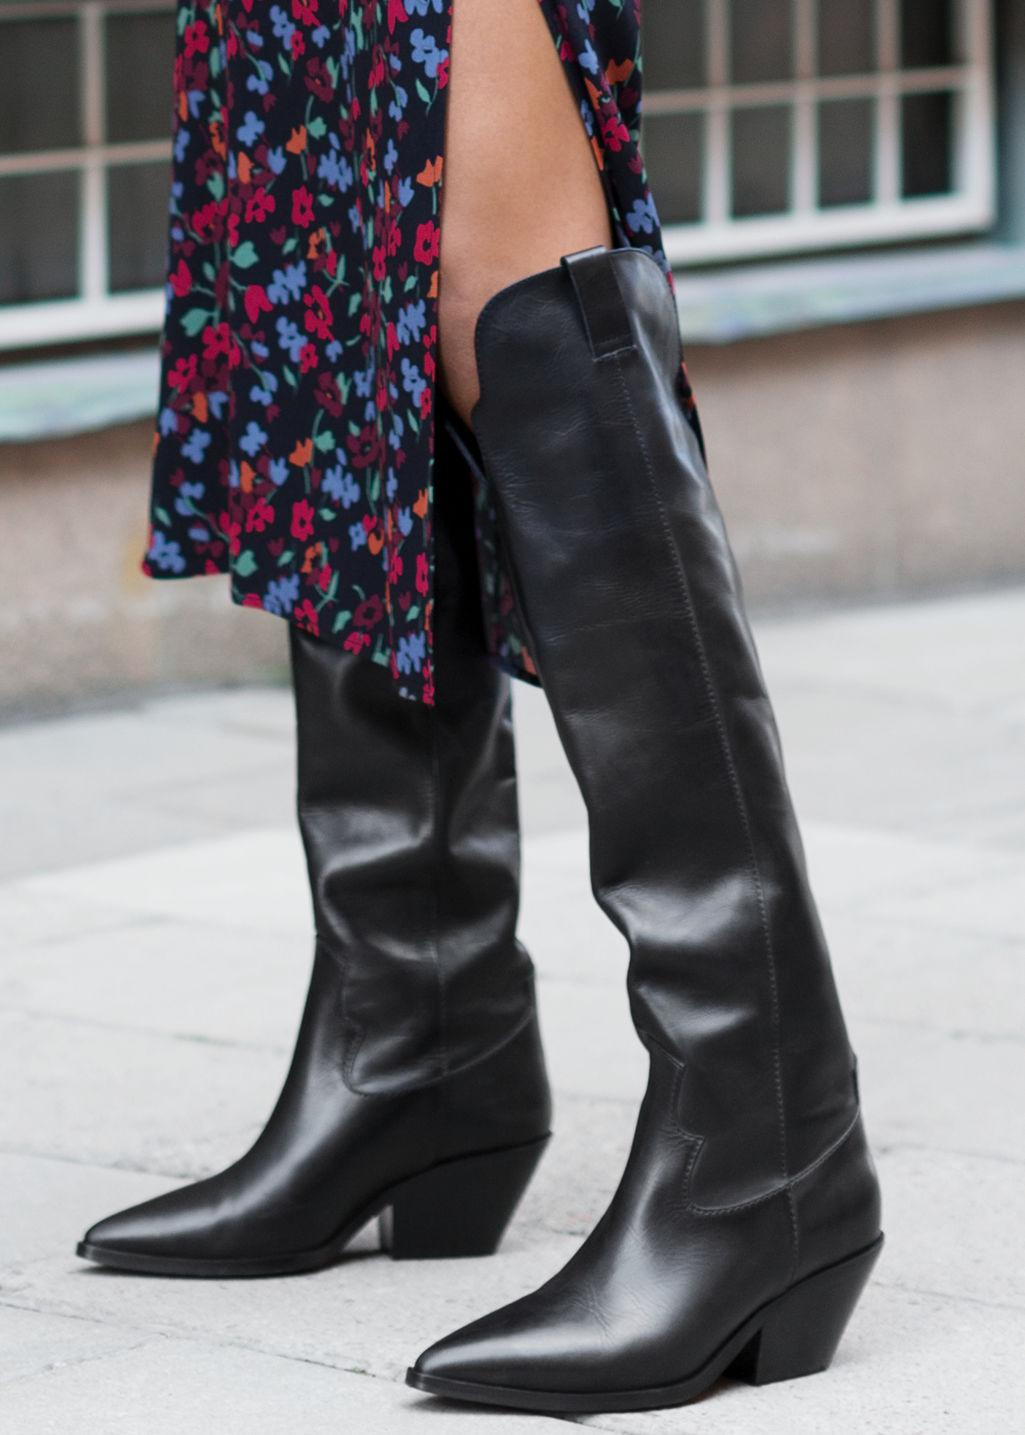 Boots stories ballet Dear Prudence: